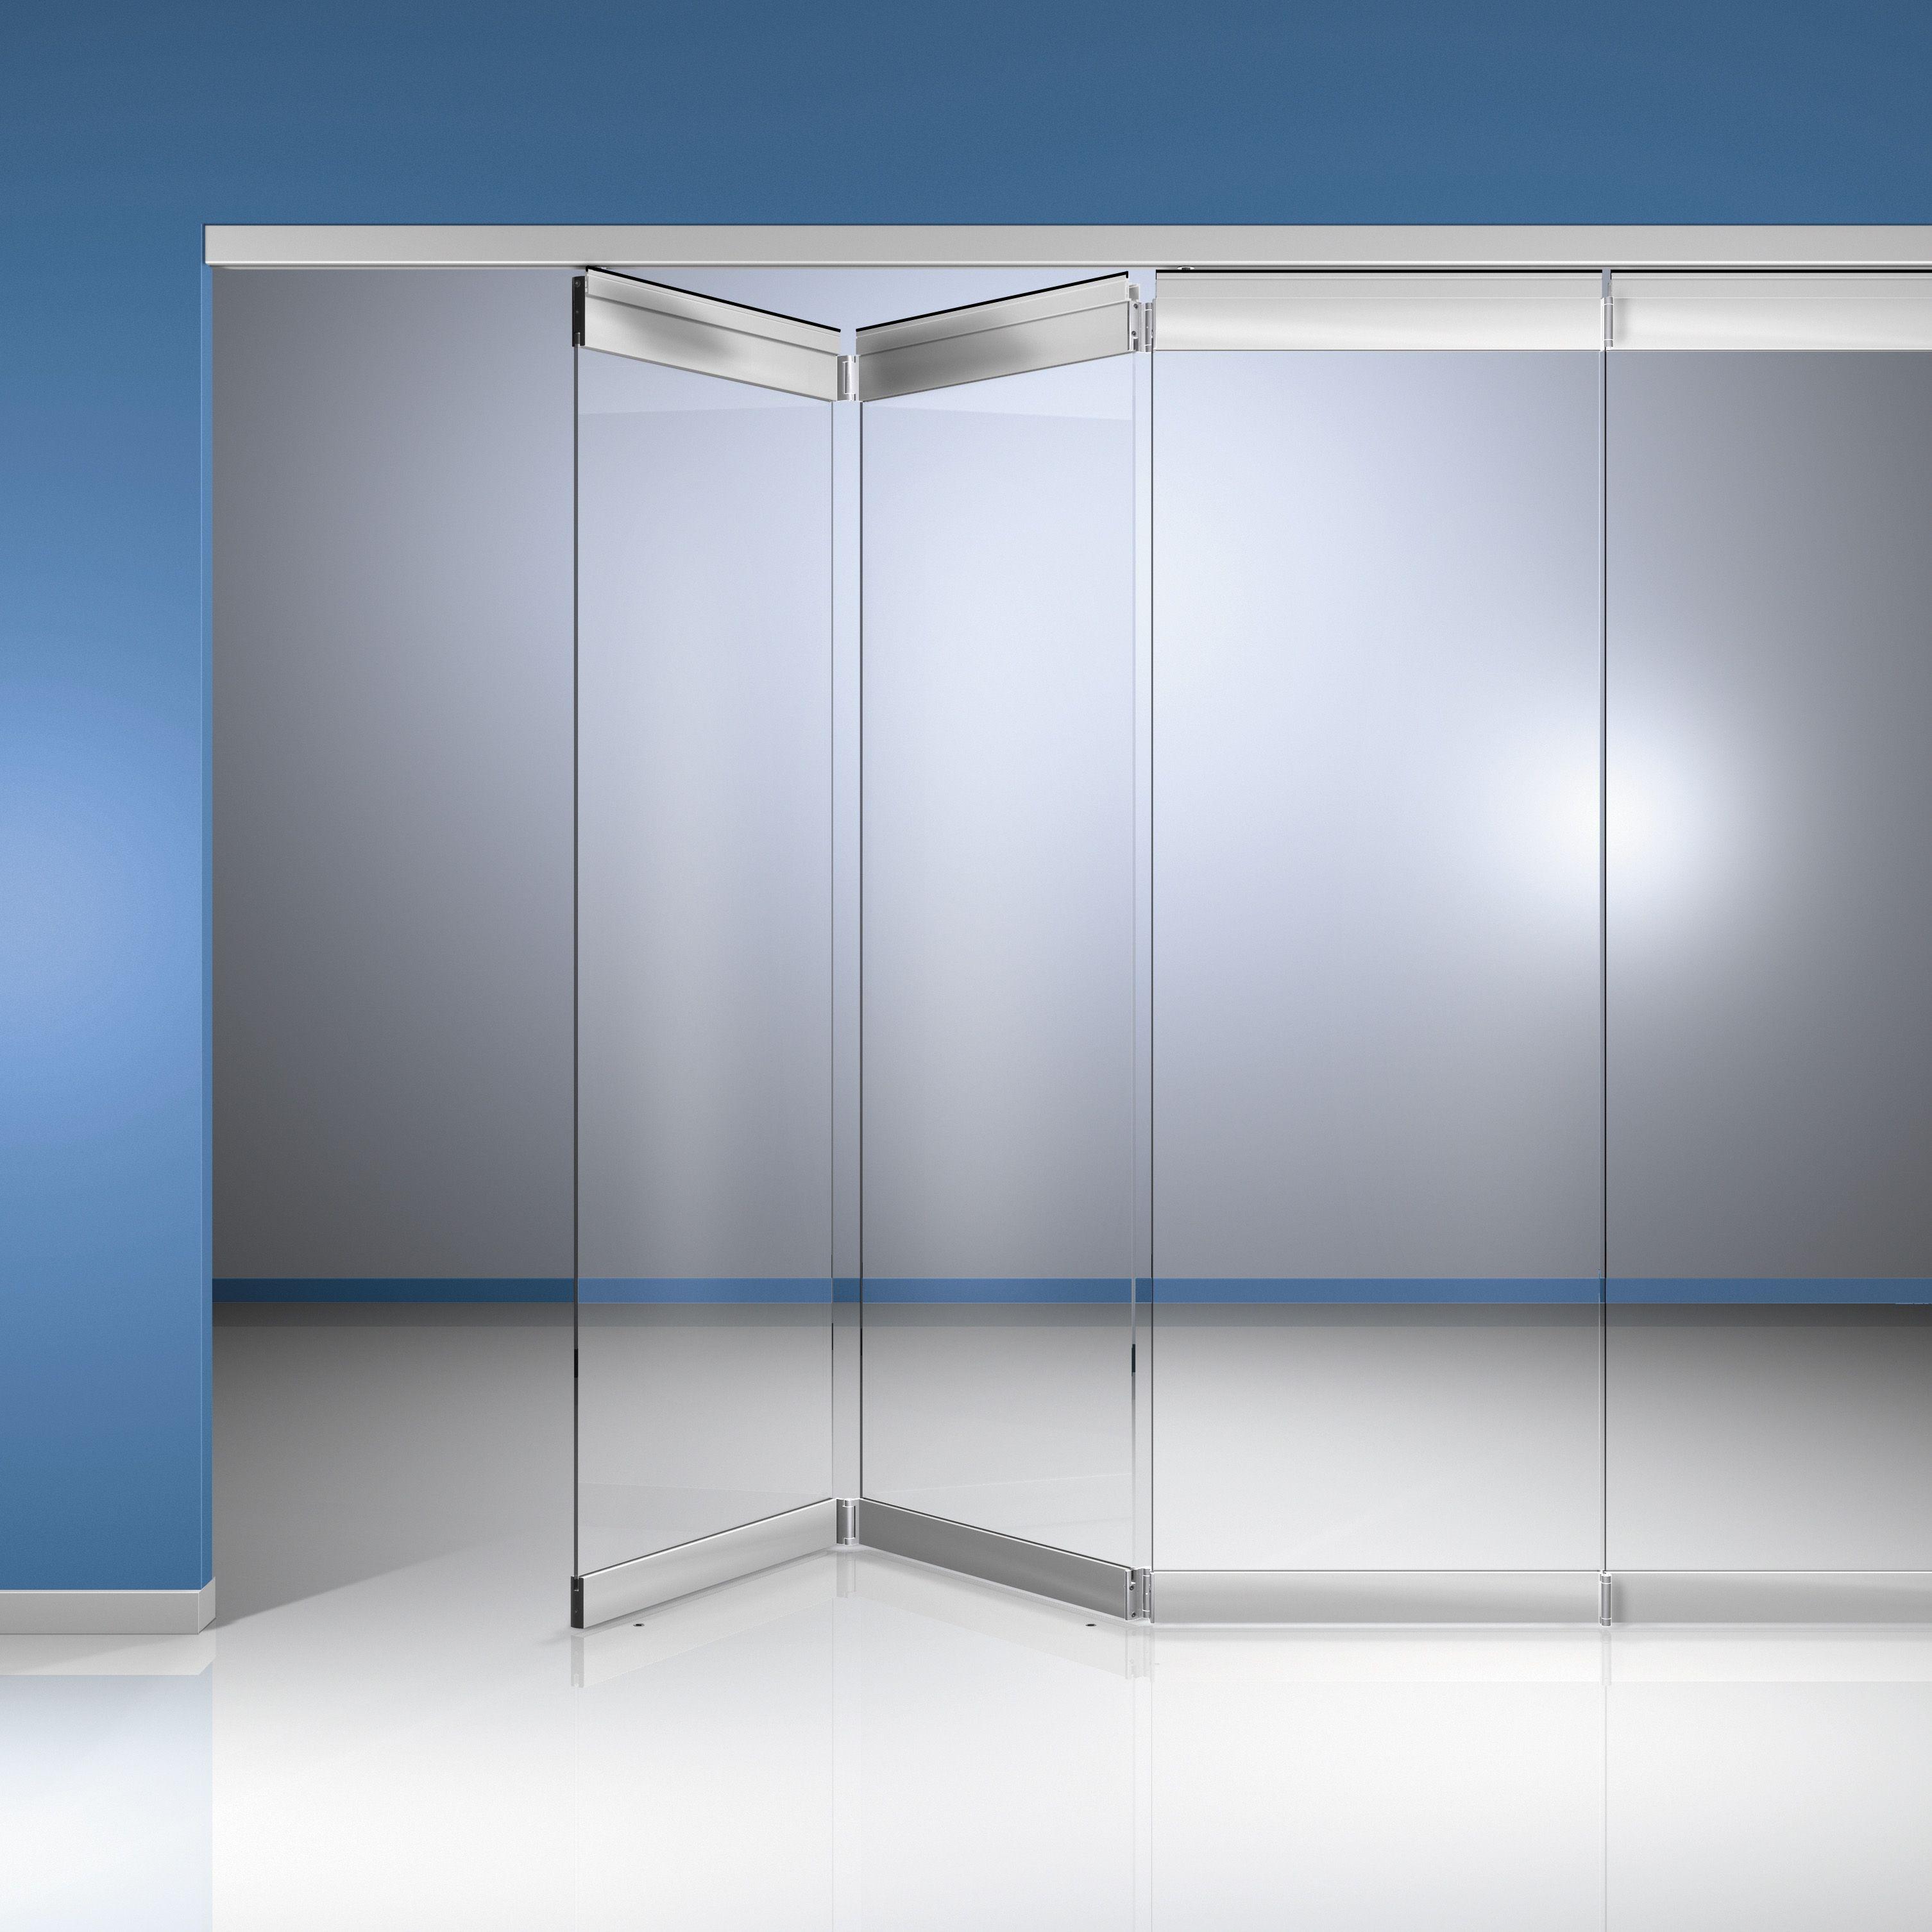 dorma interior glass door systems fsw g. Black Bedroom Furniture Sets. Home Design Ideas